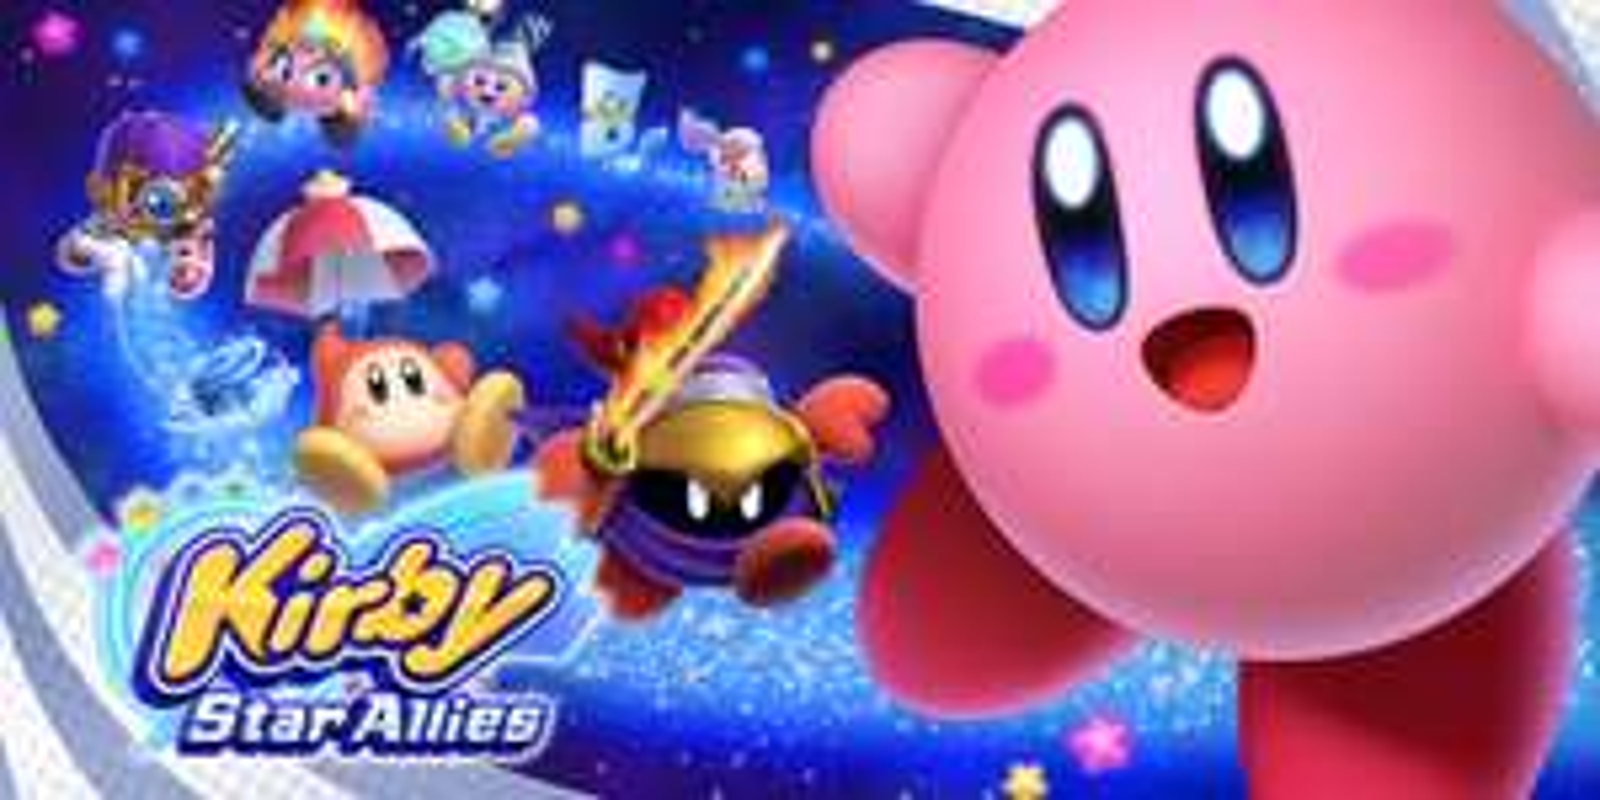 Kirby: Star Allies [FREE DEMO] - Nintendo Switch Eshop for Europe